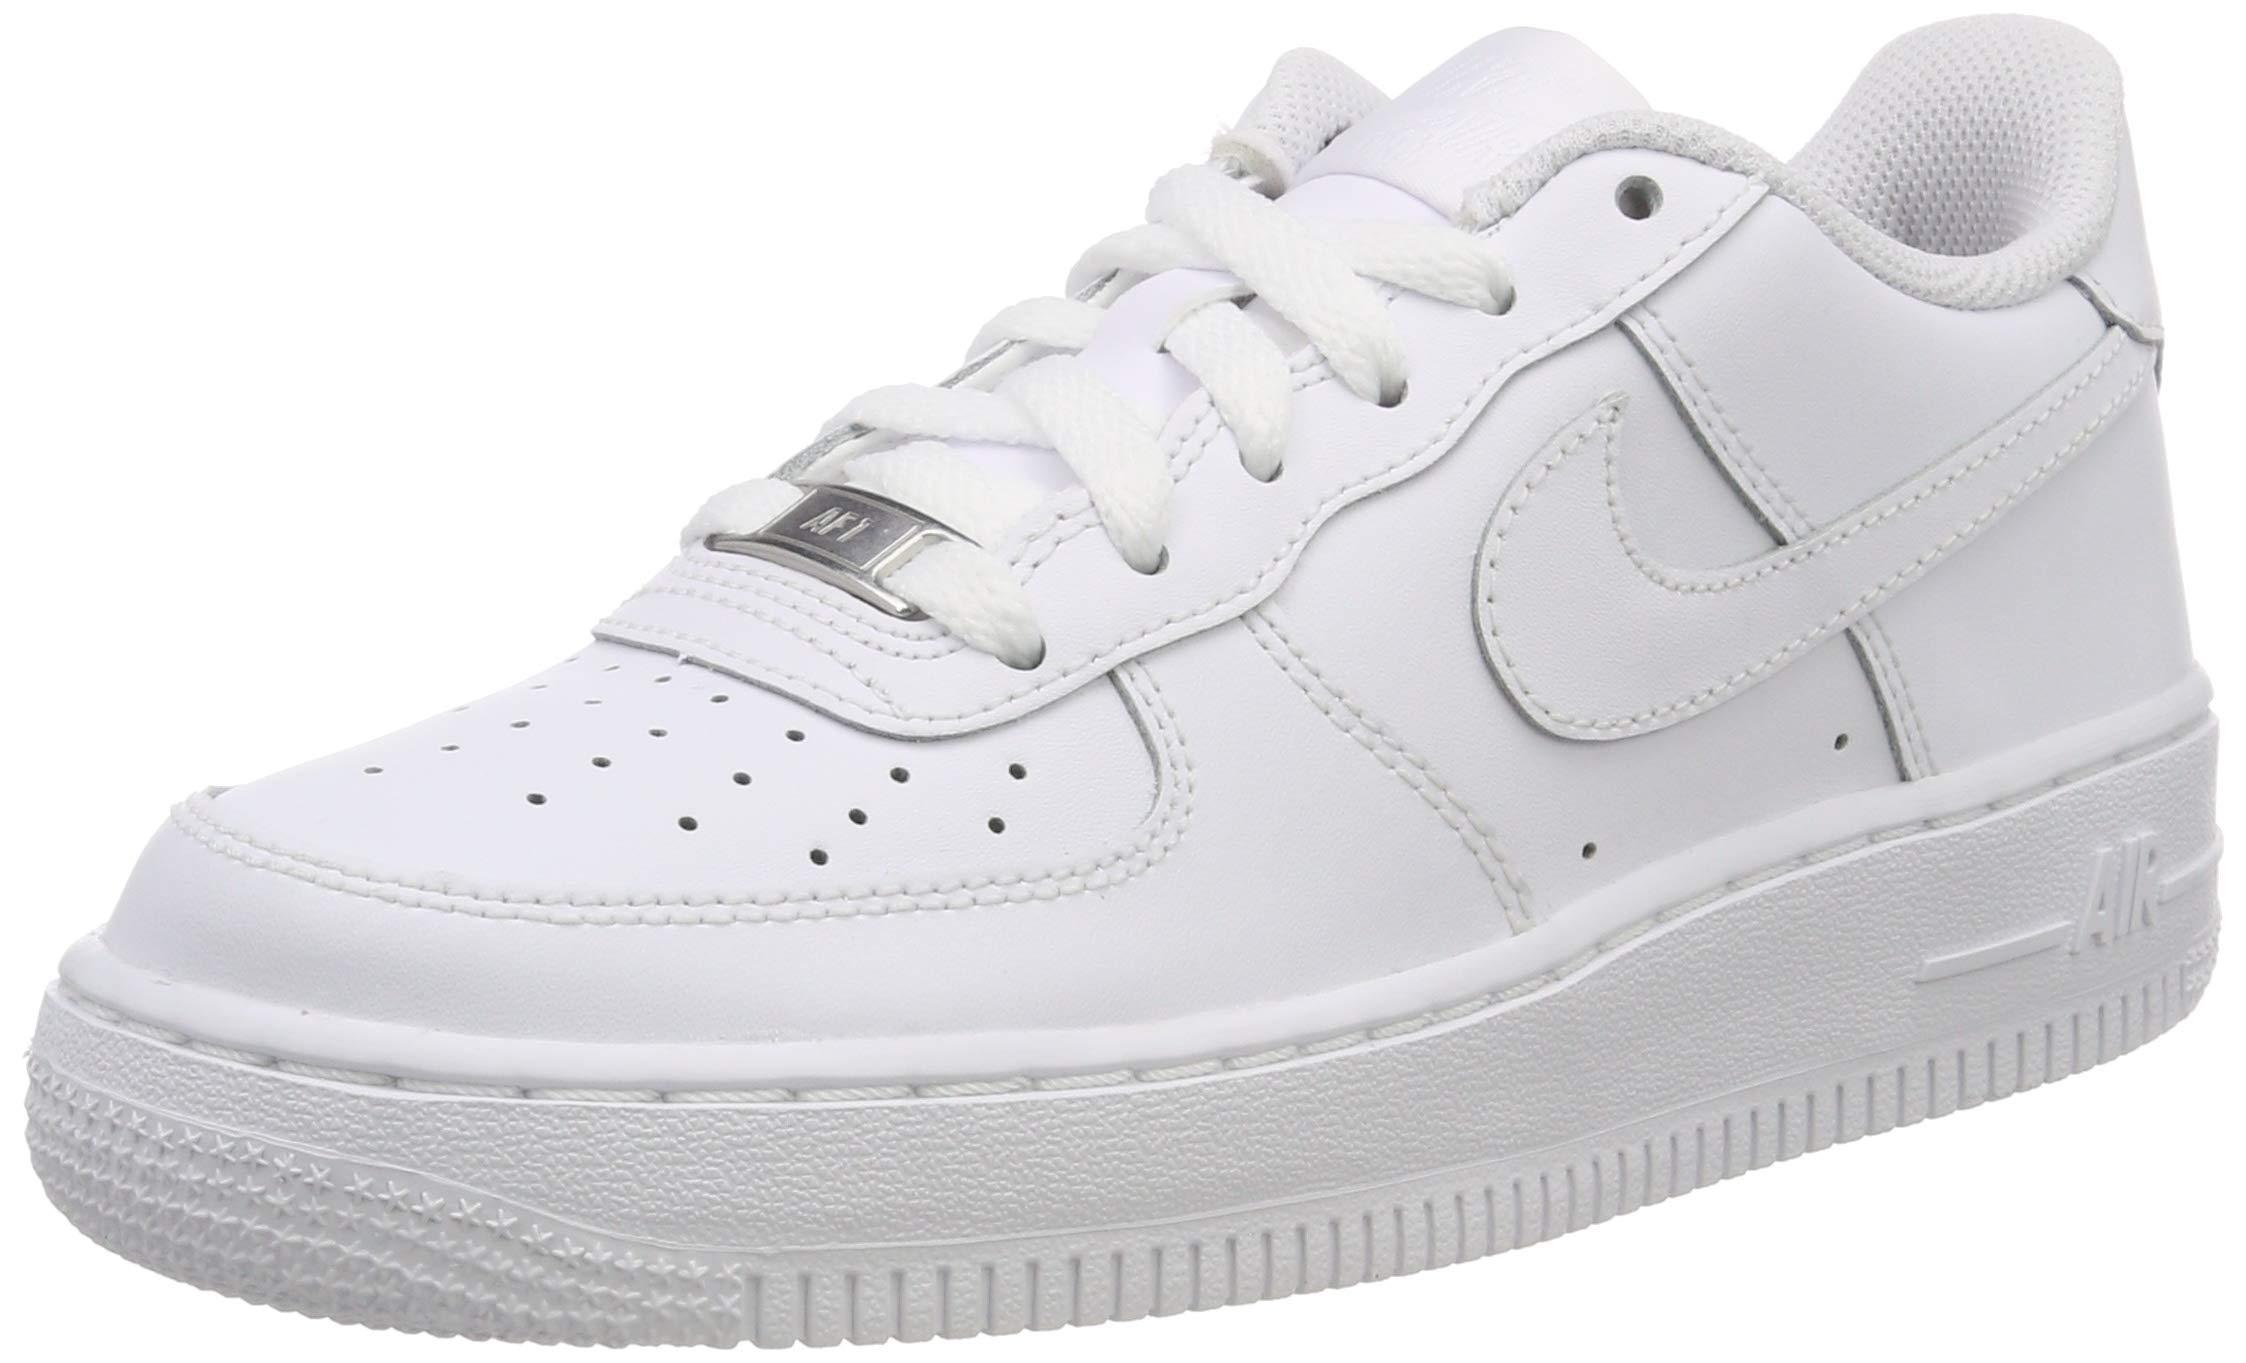 Nike Kids Air Force 1 (GS) White/White/White Basketball Shoe 5.5 Kids US